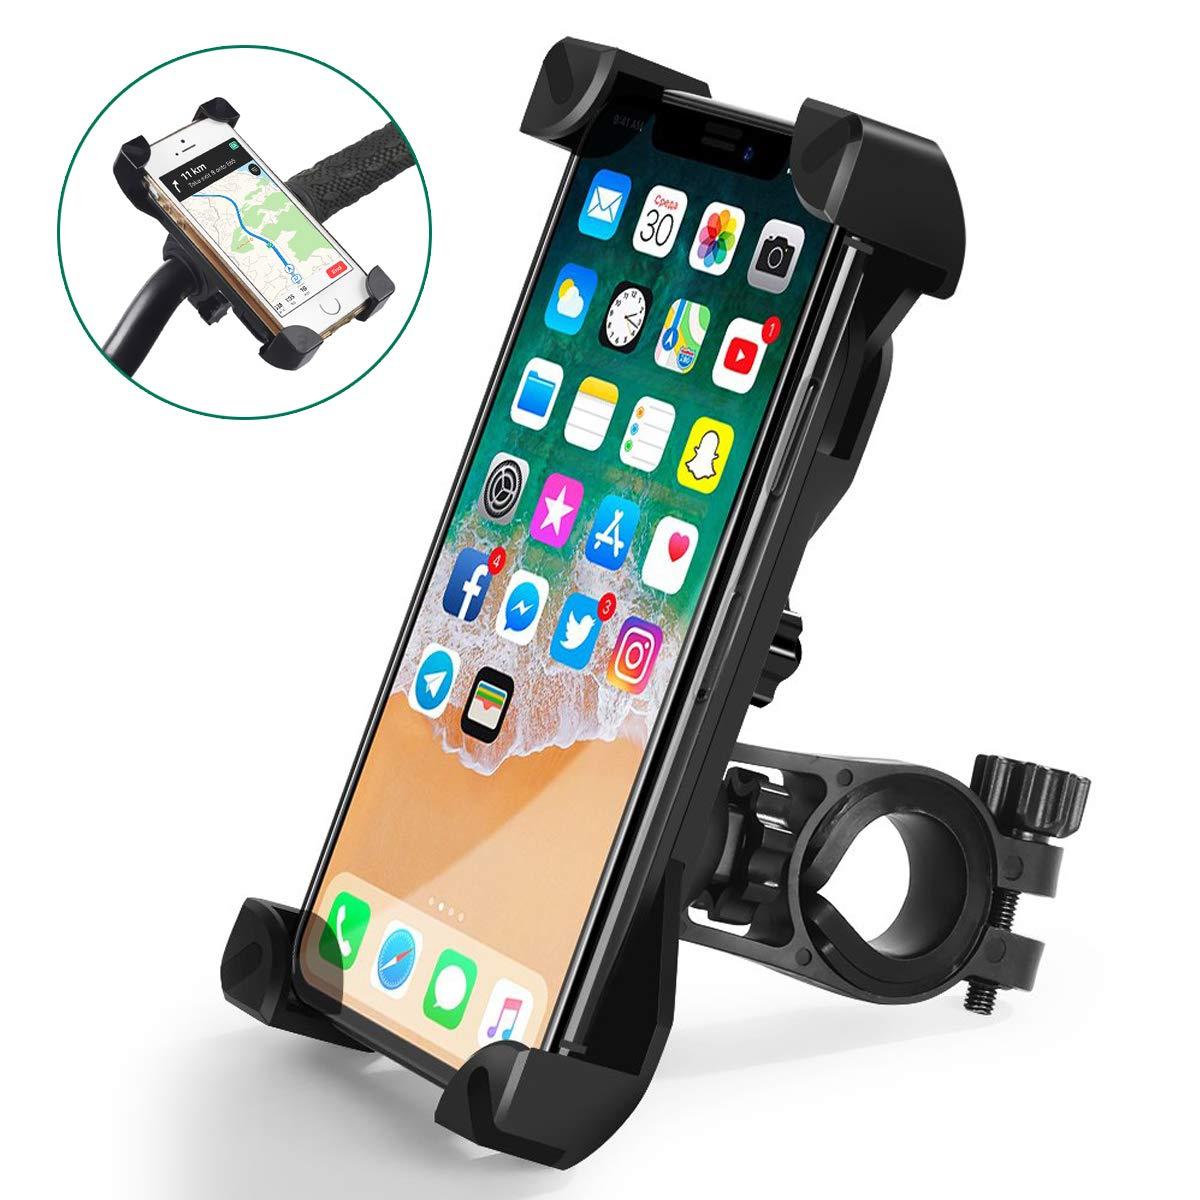 GPS y 3.5-6.5 Dispositivos Xiaomi RedMi Note 9 OMERIL Soporte Movil Bicicleta y Moto Huawei P20 Anti Vibraci/ón Soporte Movil Bici Universal con 360/° Rotaci/ón para iPhone X//8//7 Samsung S9//S8